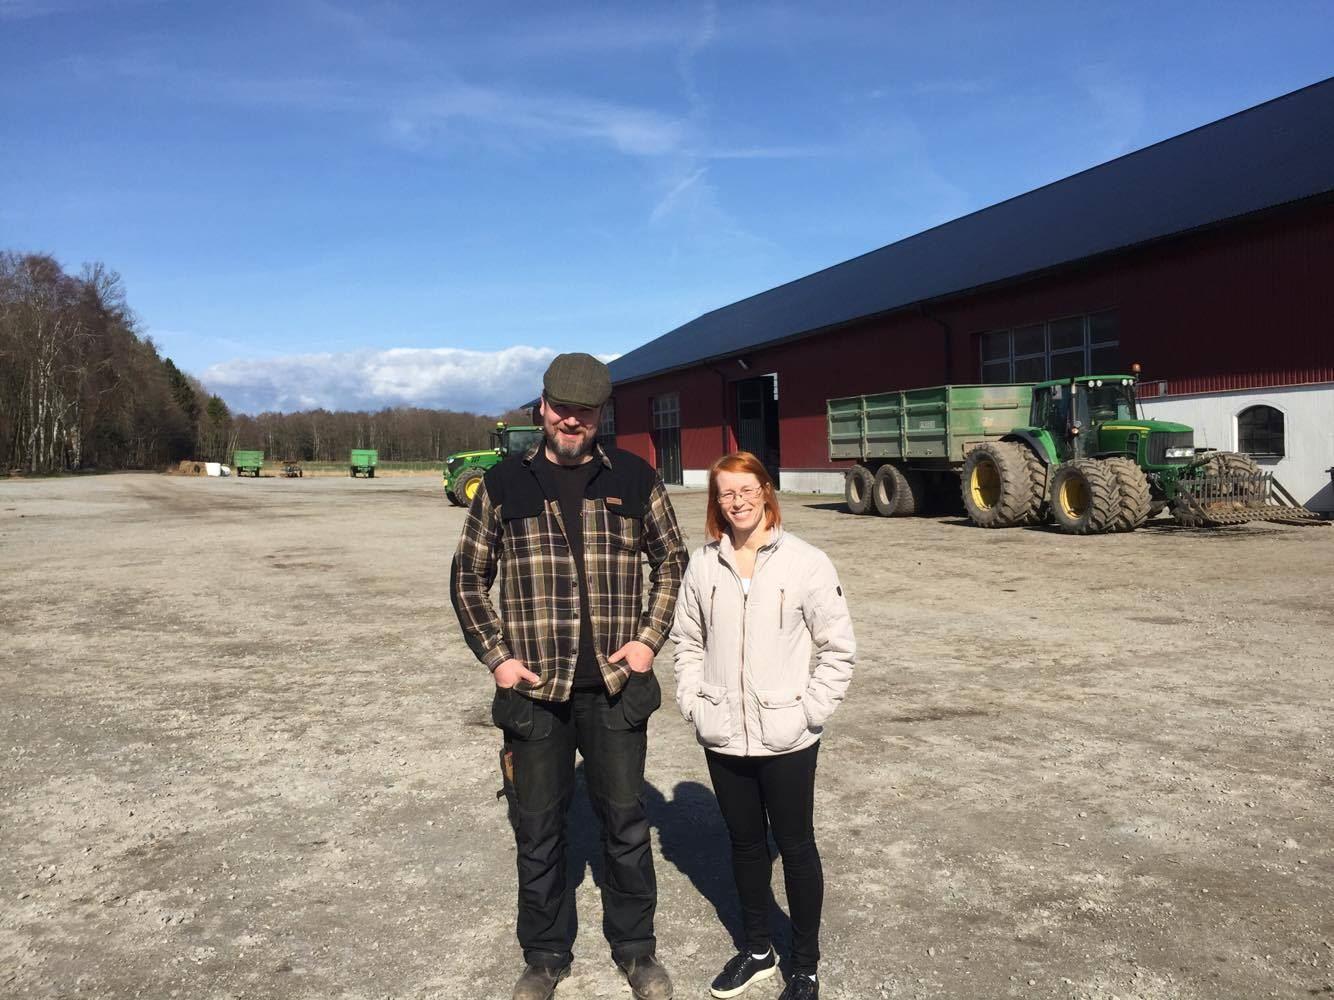 Lantbruksmässa Hulta Gård i Sölvesborg